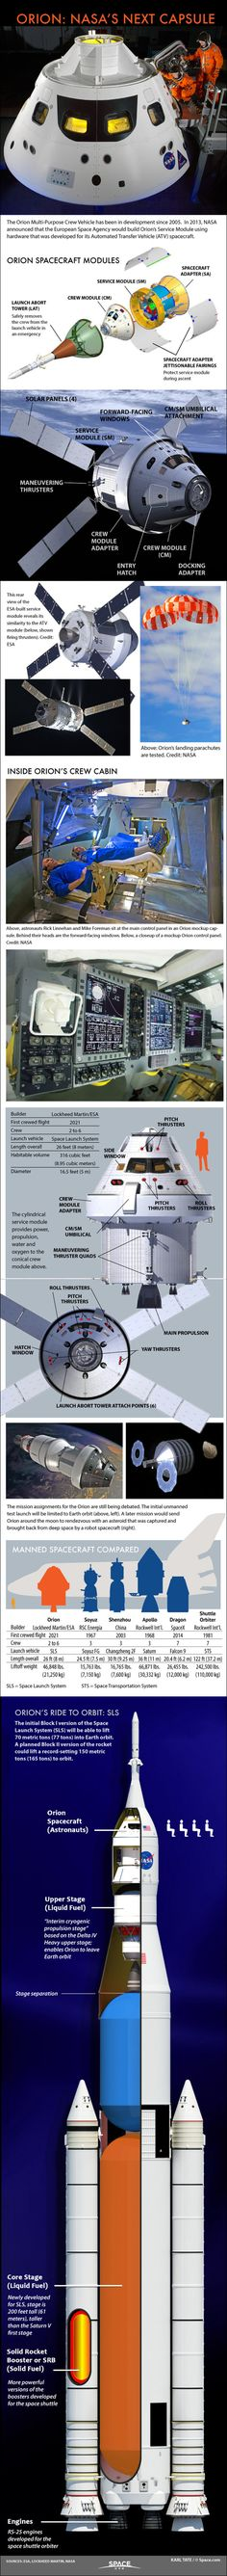 Orion - NASA's Multi-Purpose Crew Vehicle (Infographic)